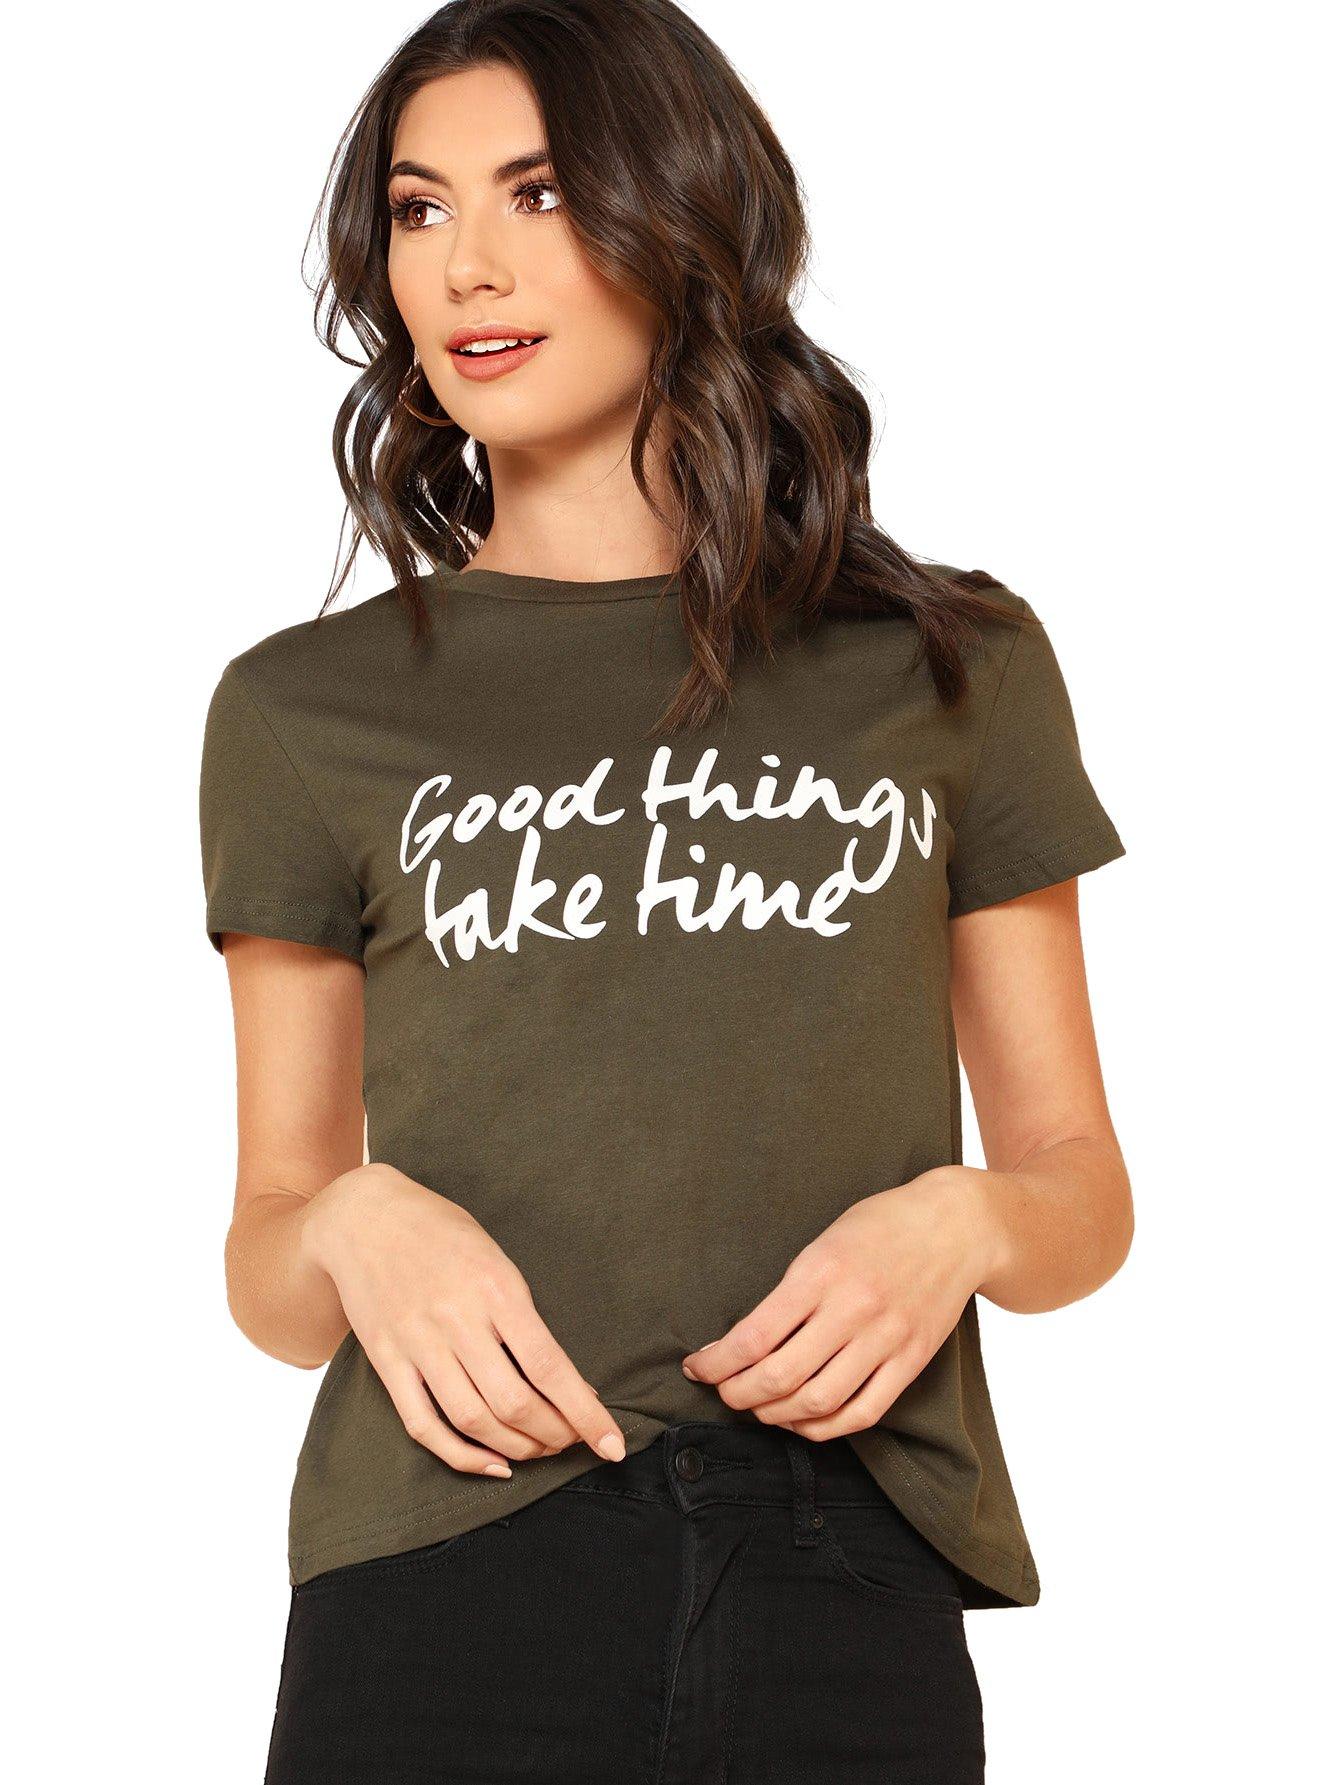 2520d6a8f SheIn Women's Cute Short Sleeve Junior Tops Teen Girls Graphic Tees Army  Green Small